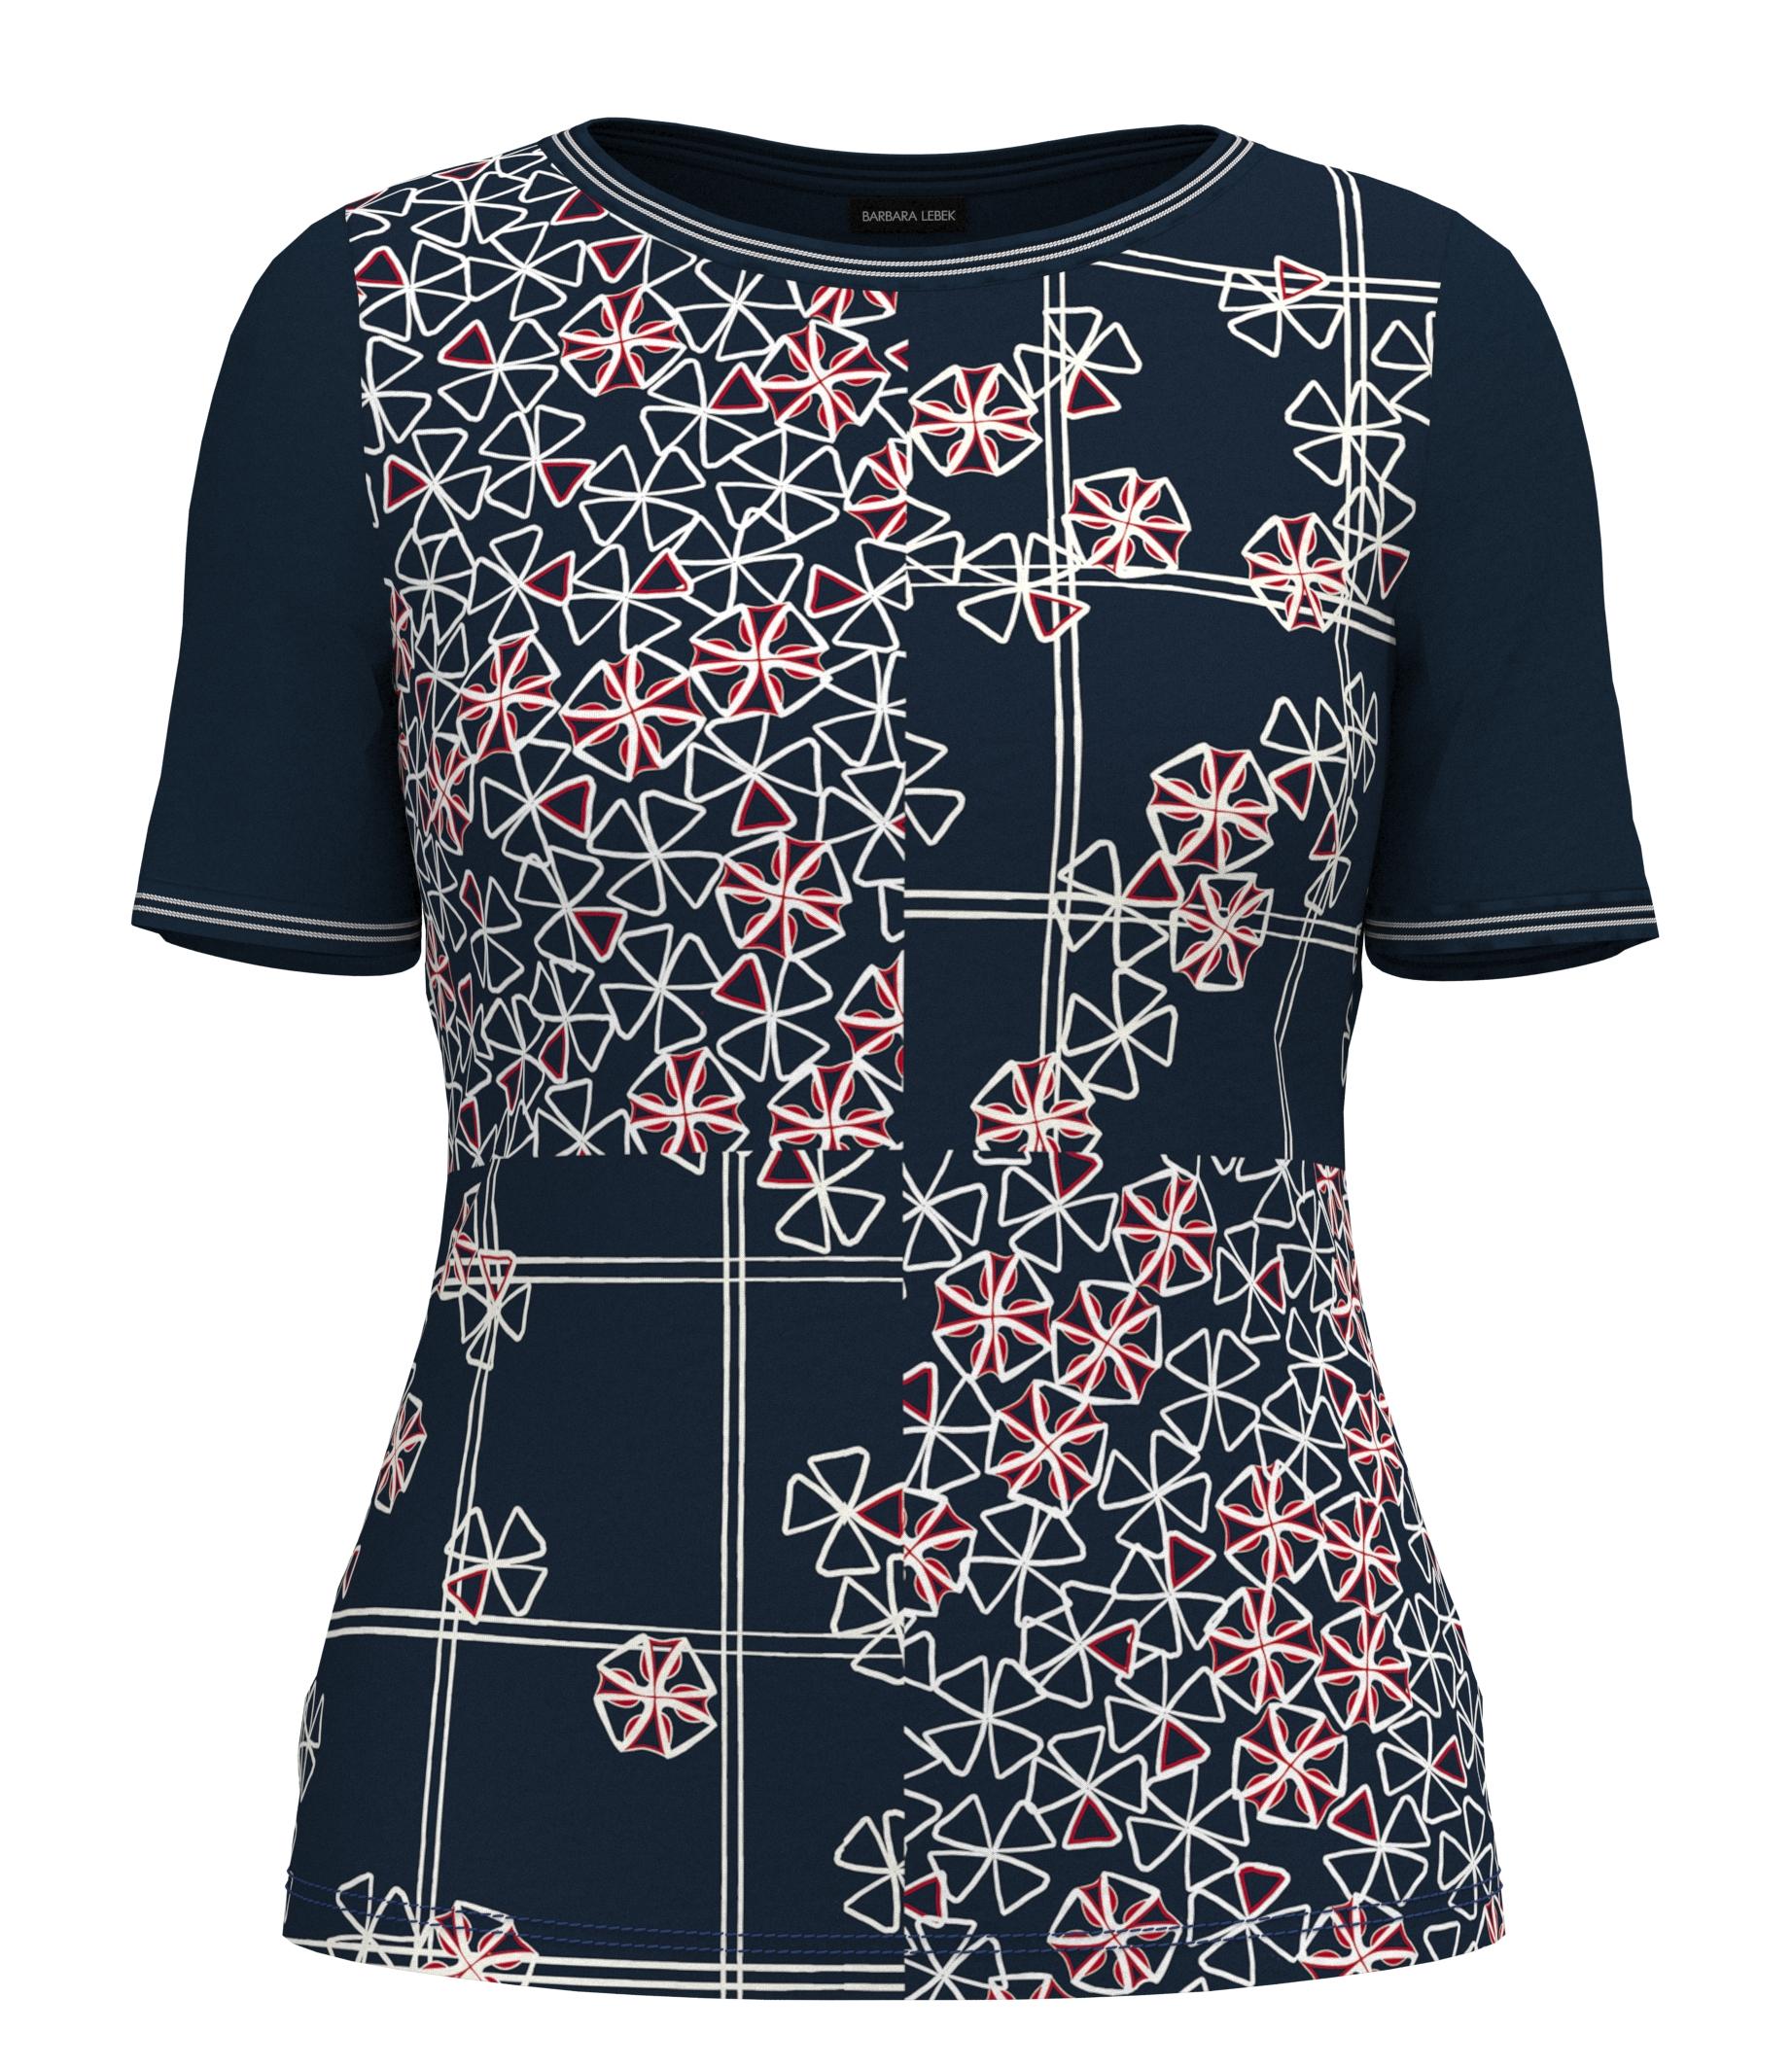 Barbara Lebek kurzarm Shirt mit floralem Muster blau